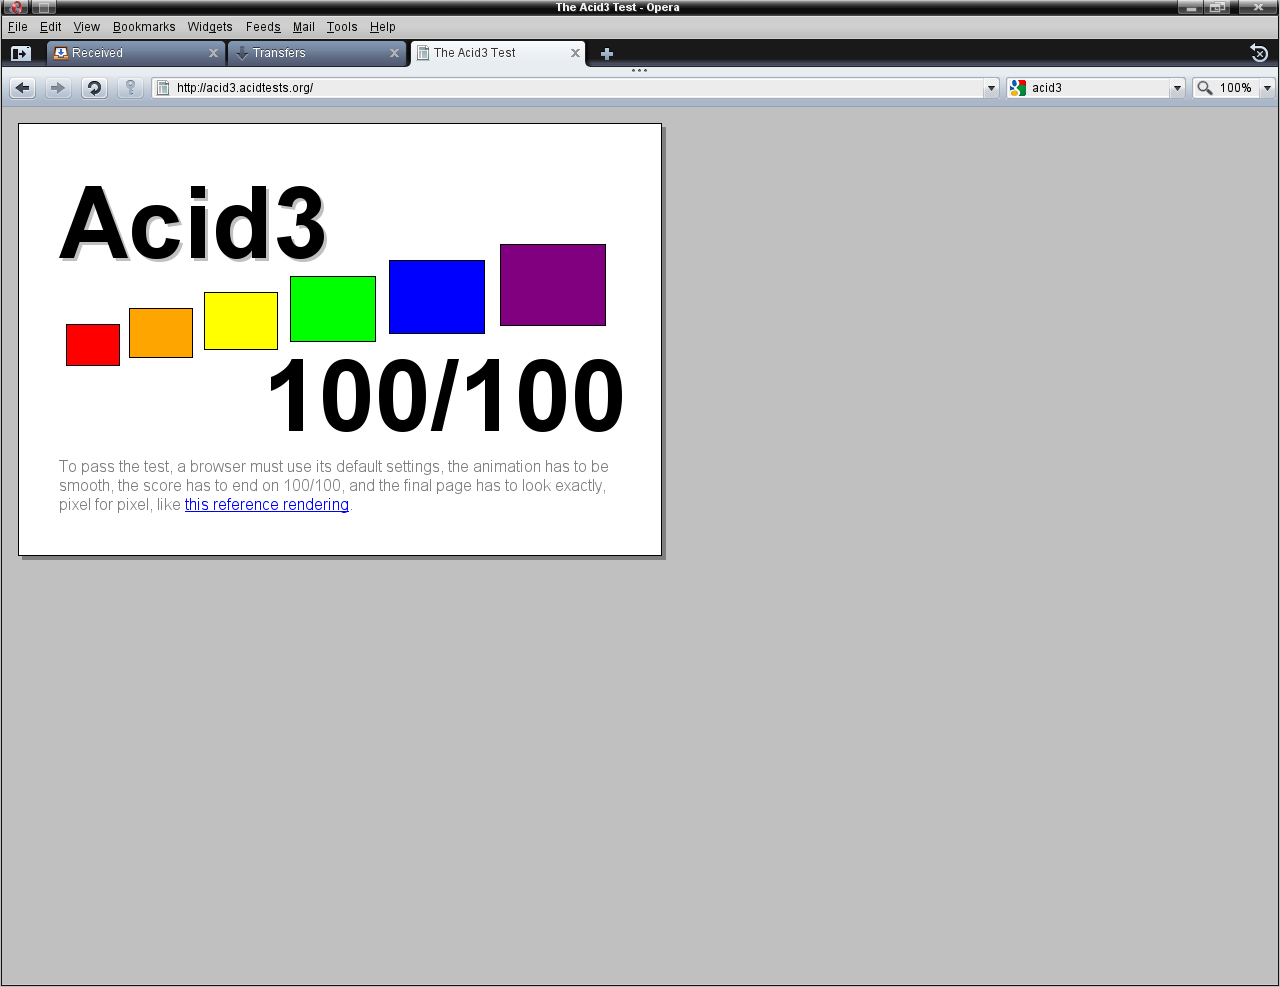 Acid3 - 100/100